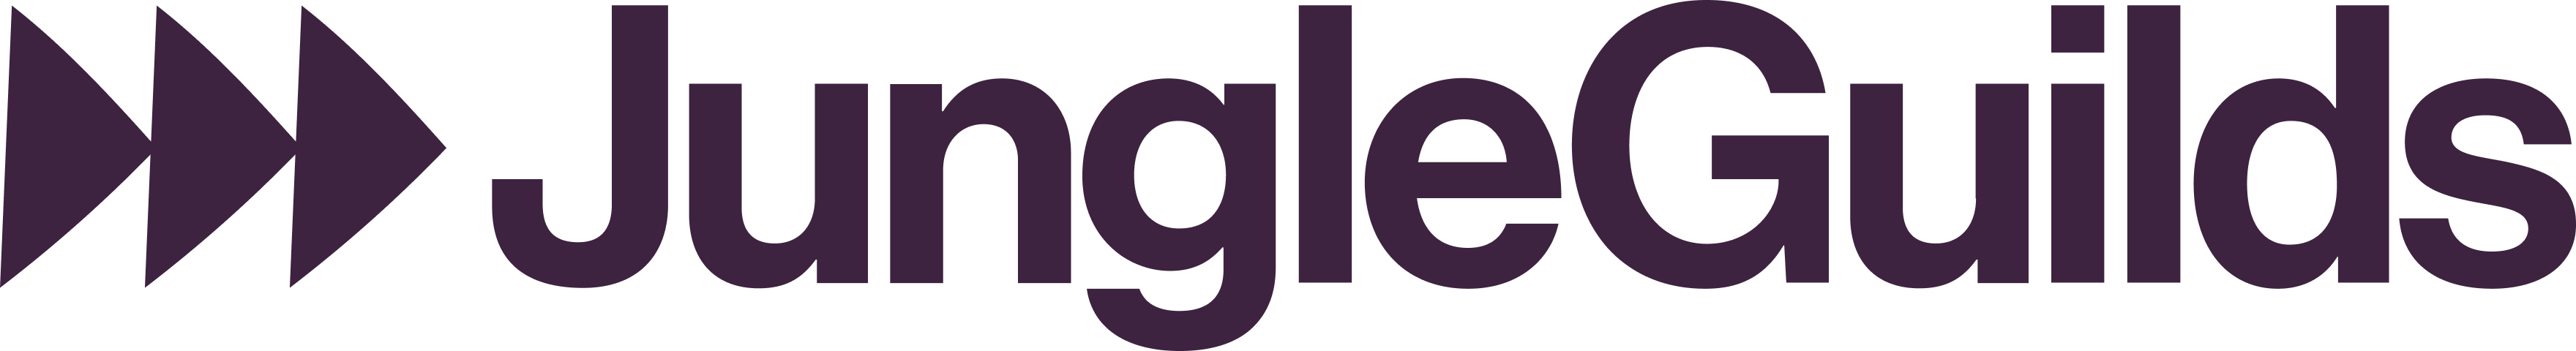 Jungle Guilds logo